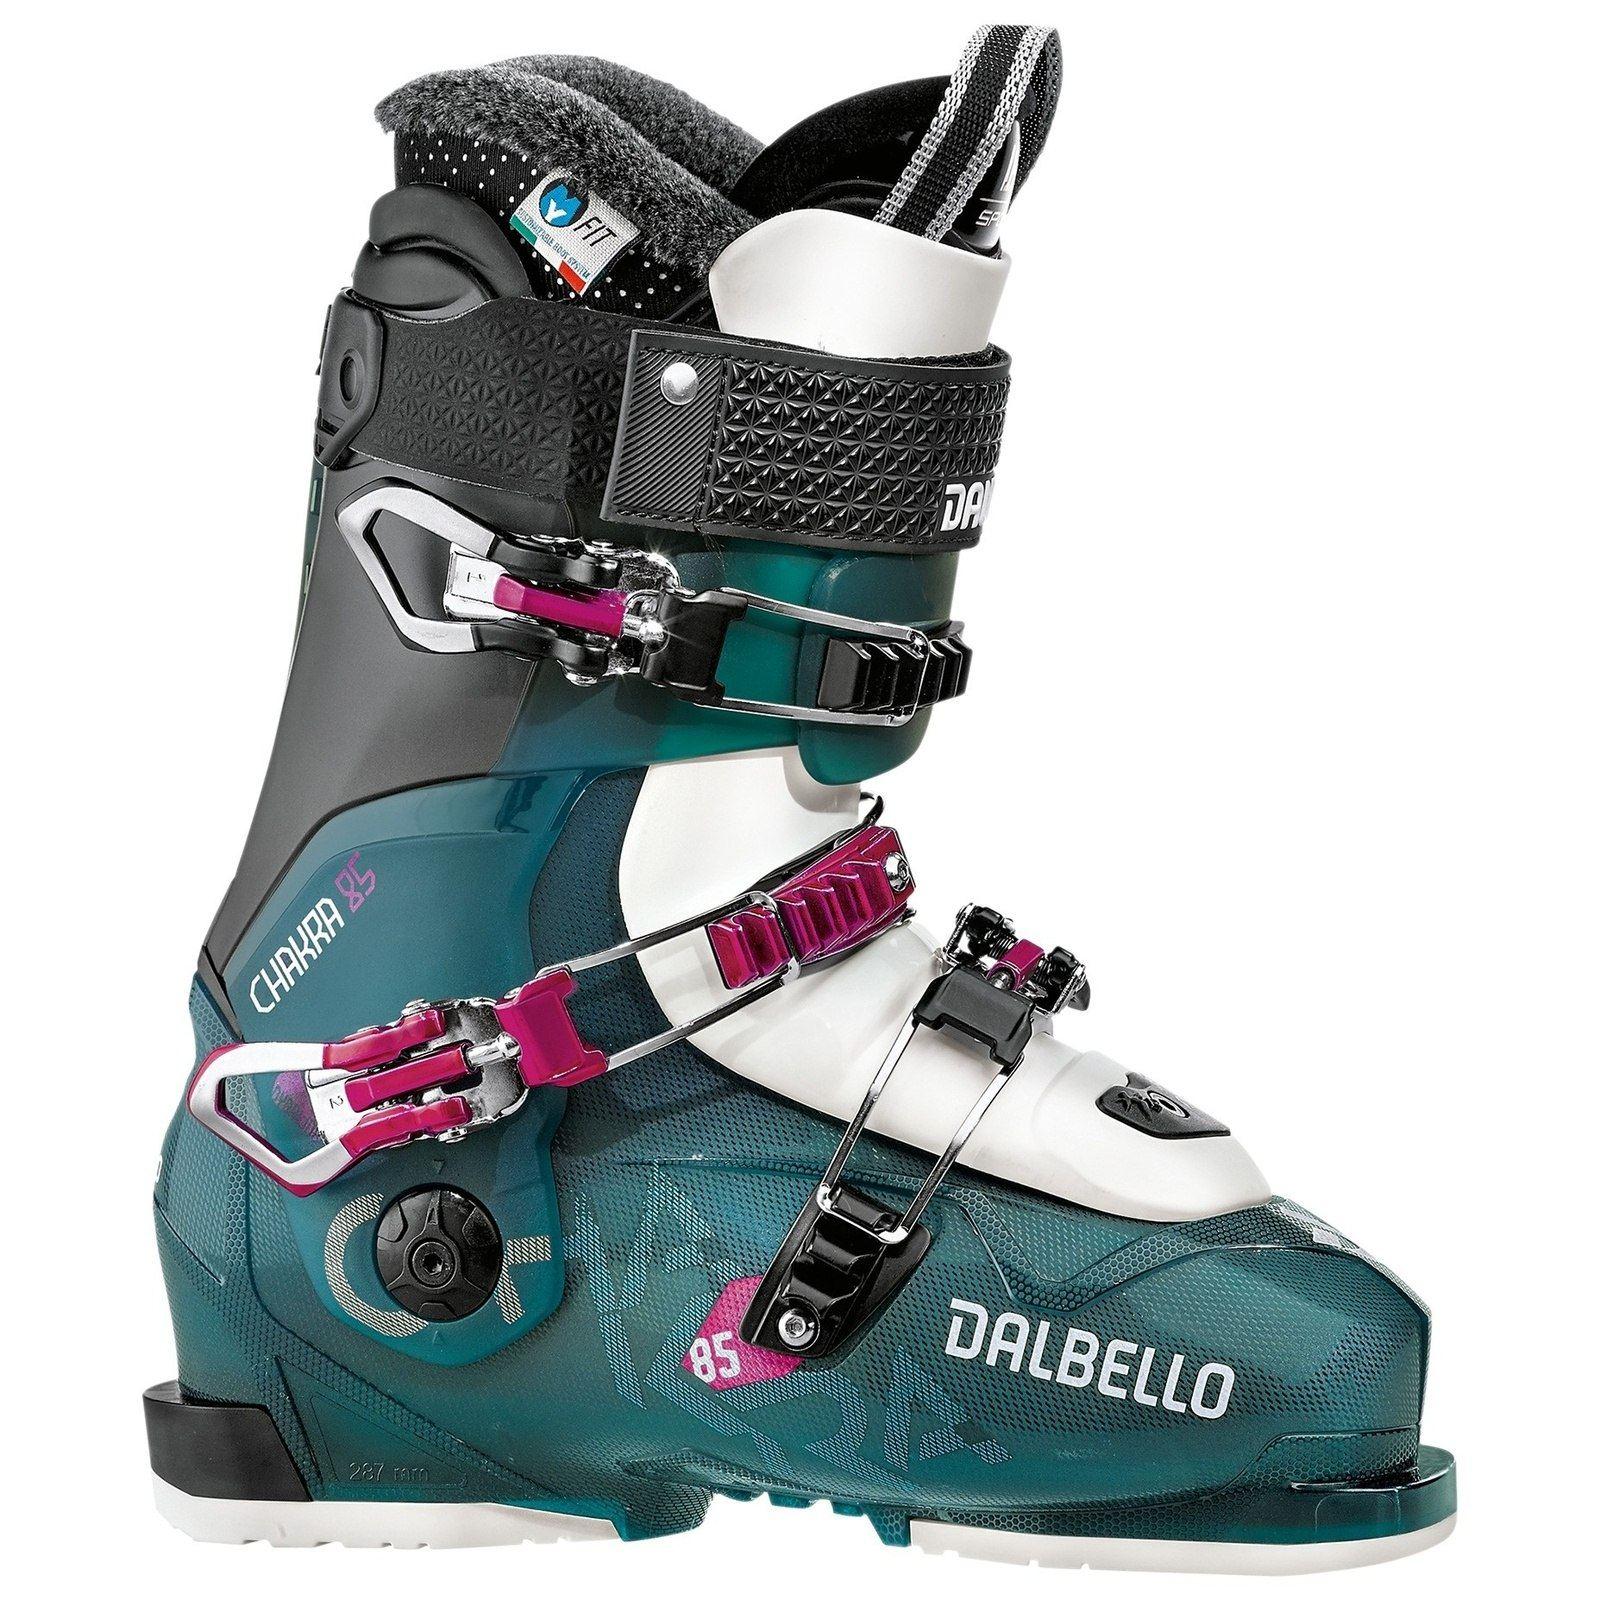 Ski Boots Sale >> Dalbello Women S Chakra 85 Ski Boots On Sale Powder7 Com